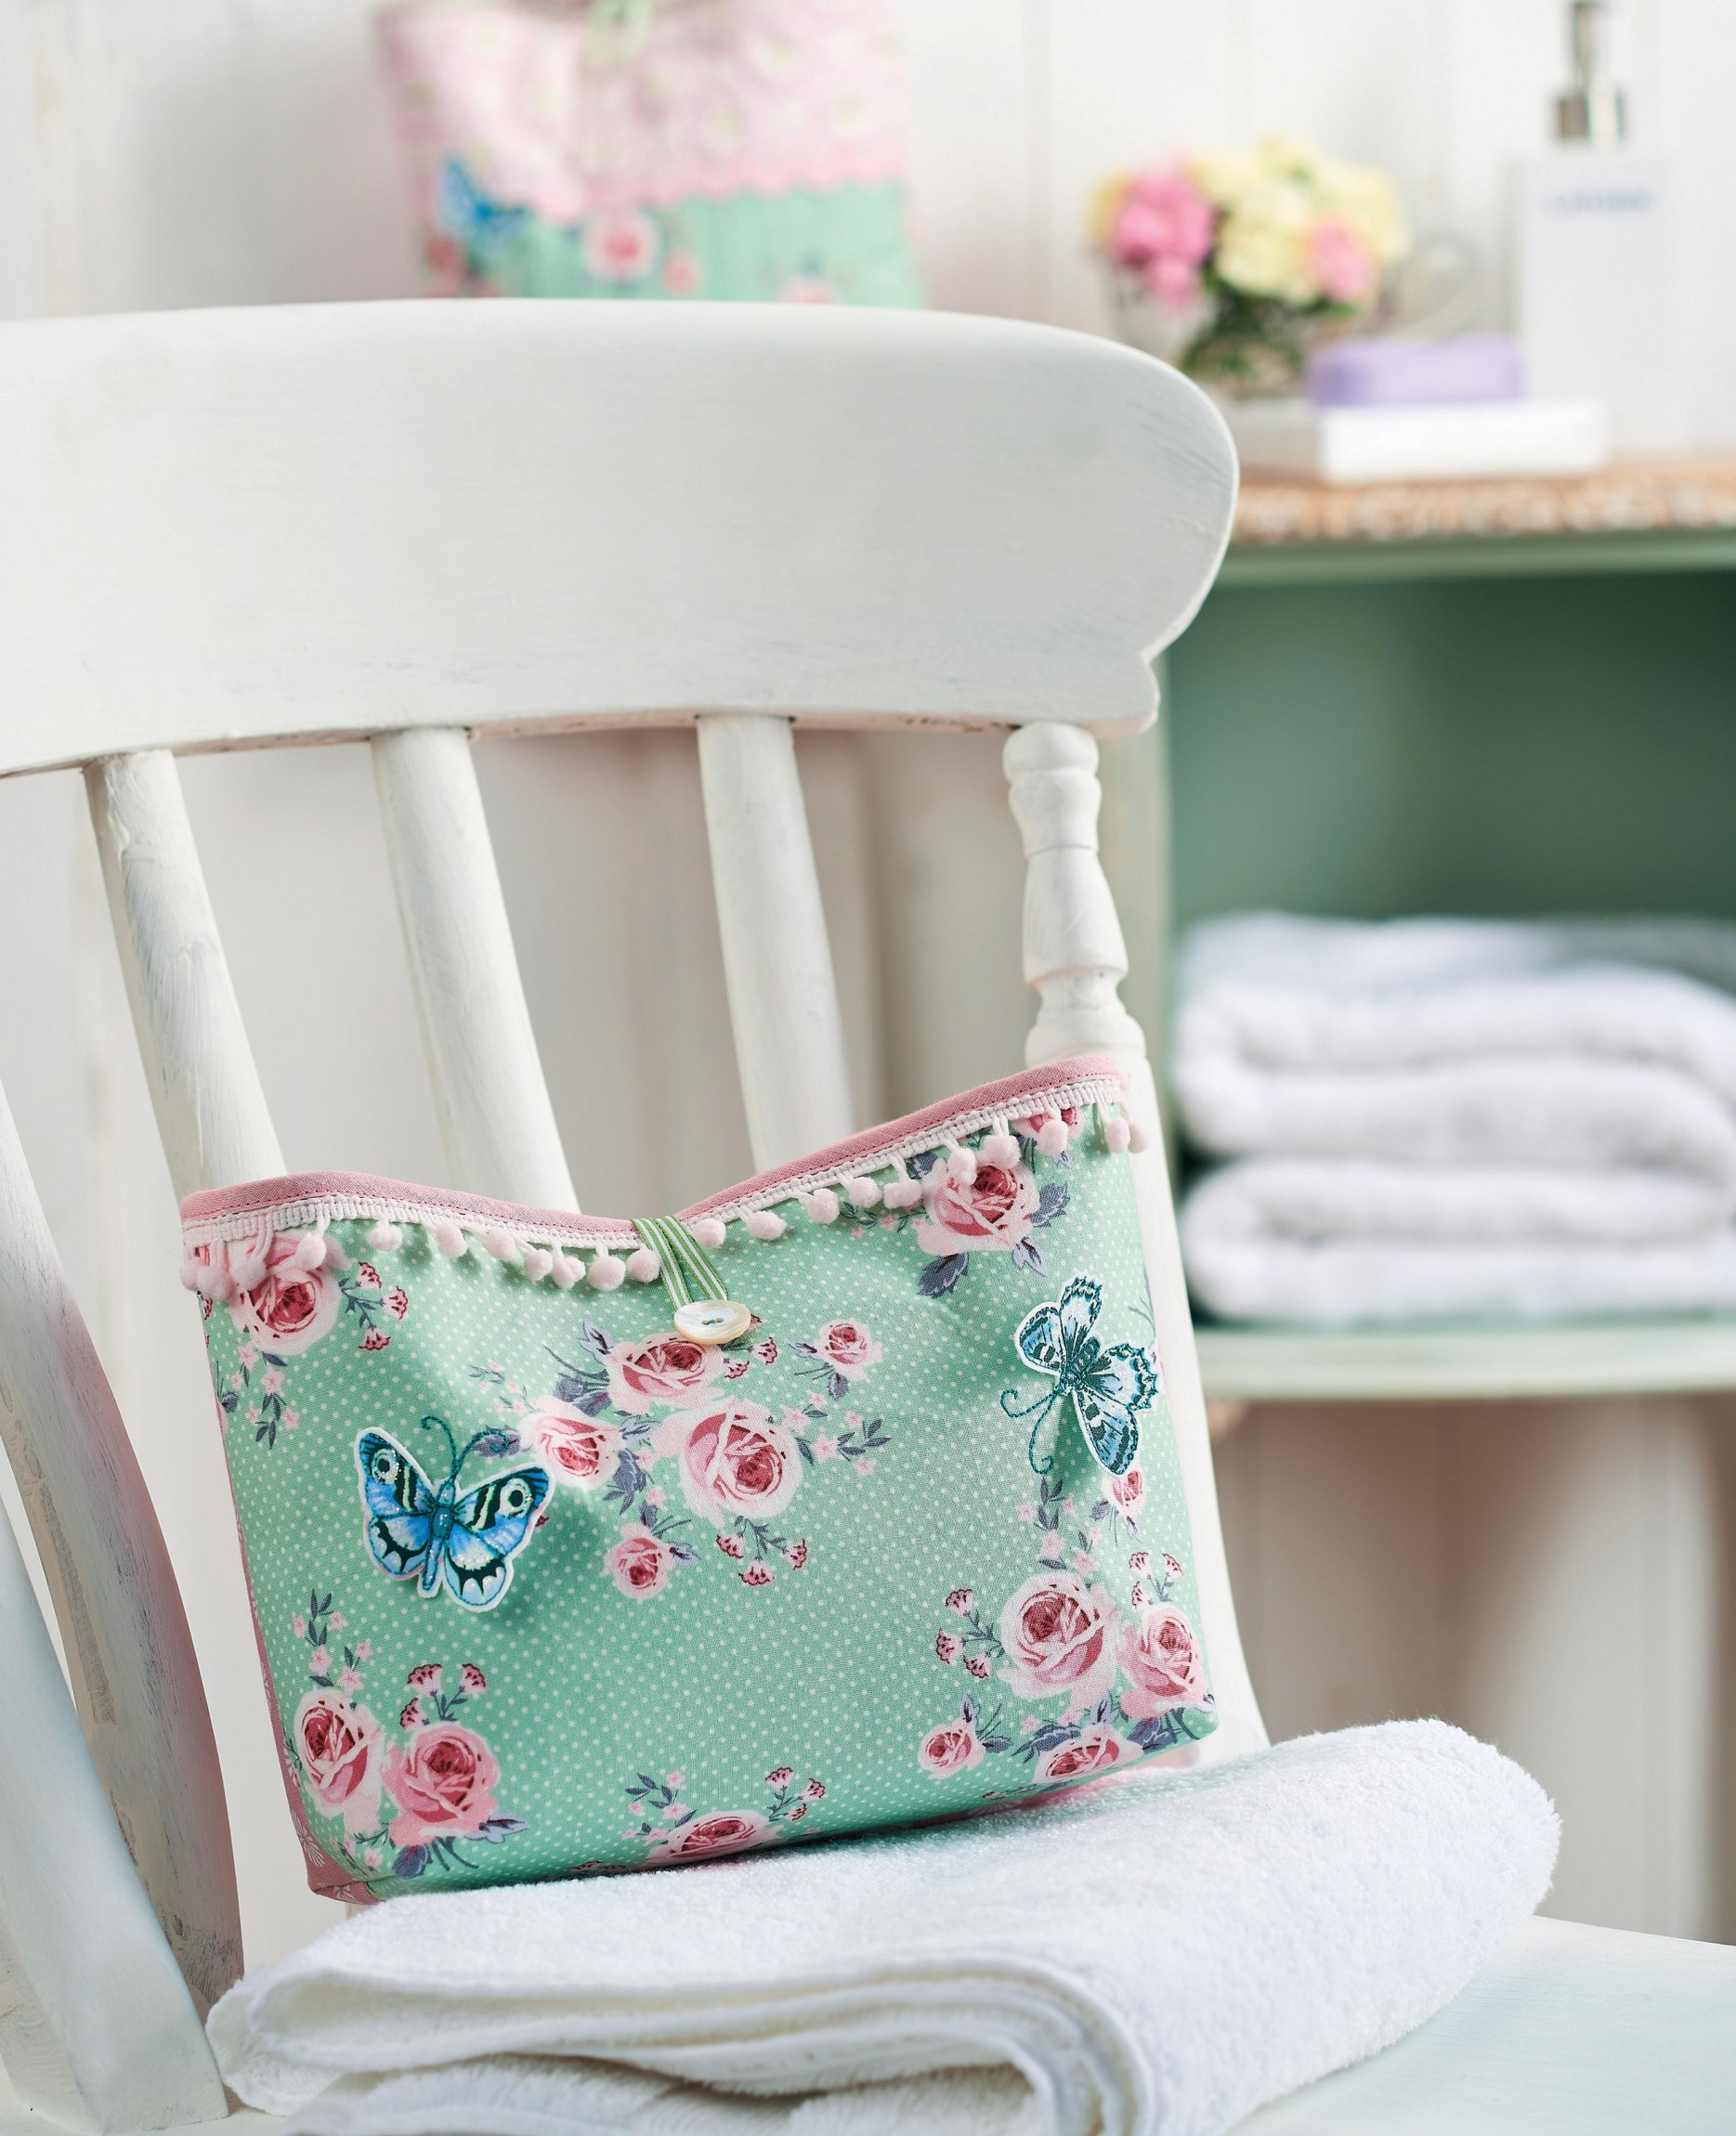 floral wash bag and hanging storage bag - free sewing patterns